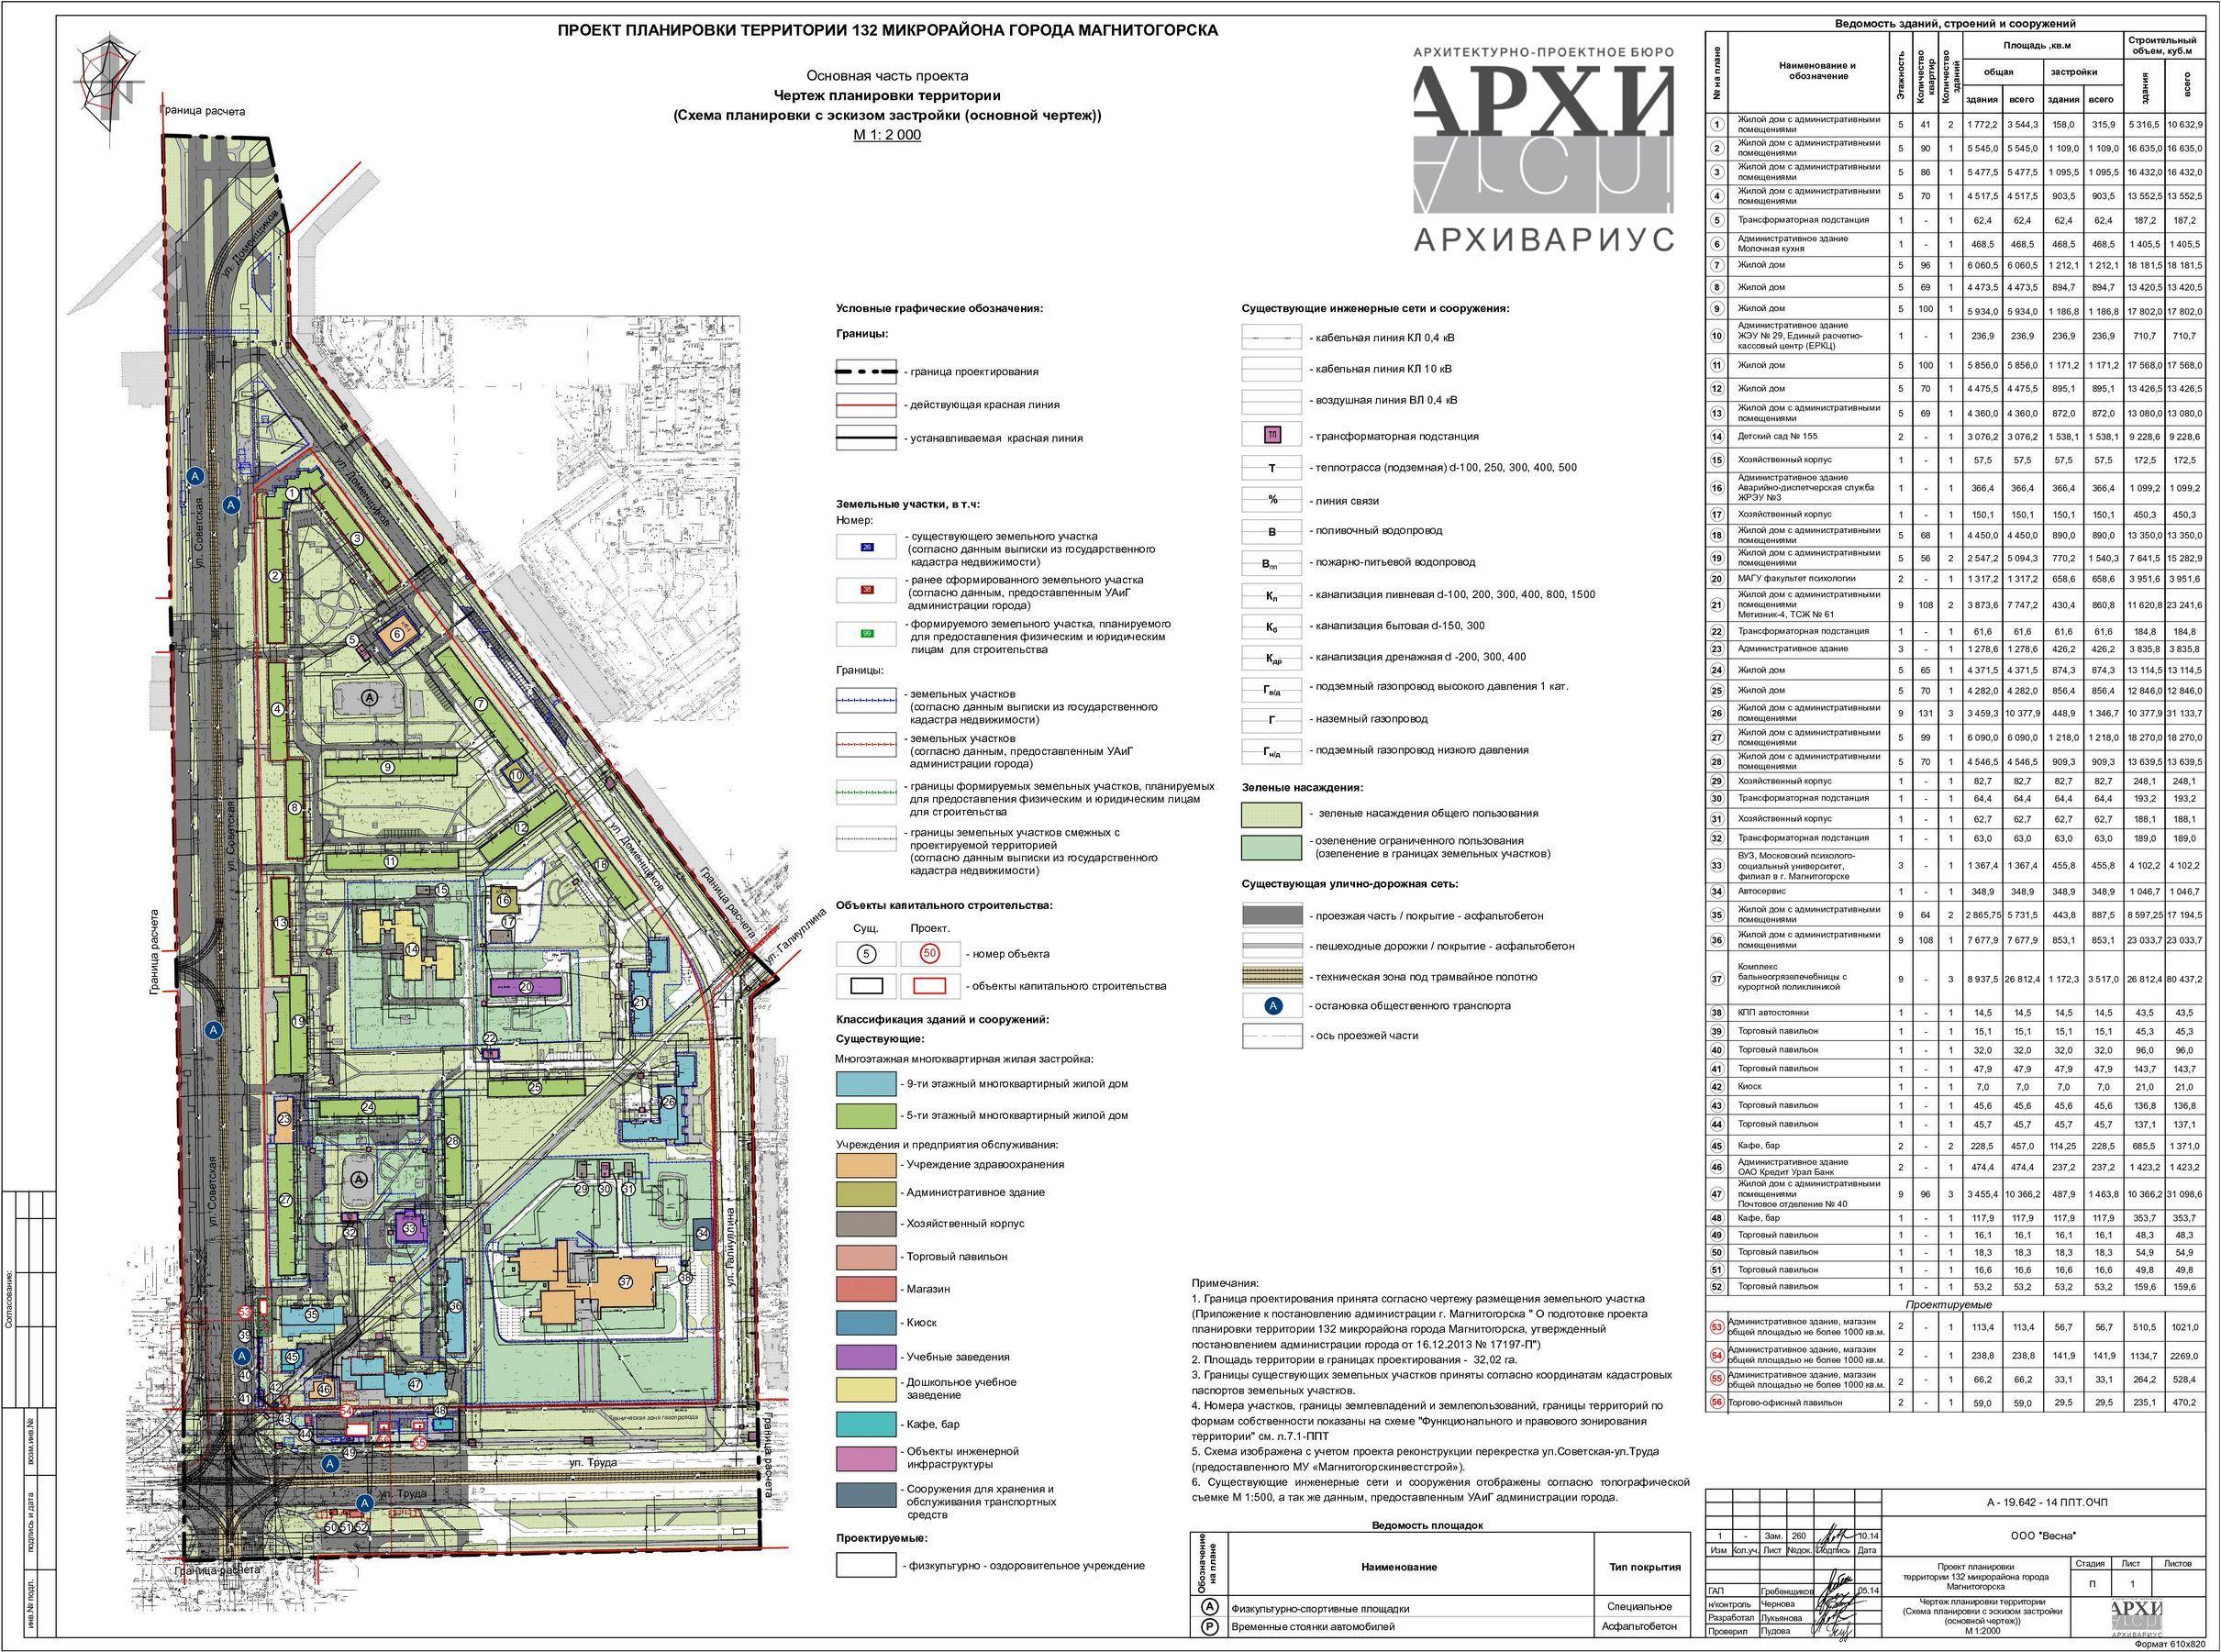 схема чертежа плана улицы пр. ленина г. стерлитамака